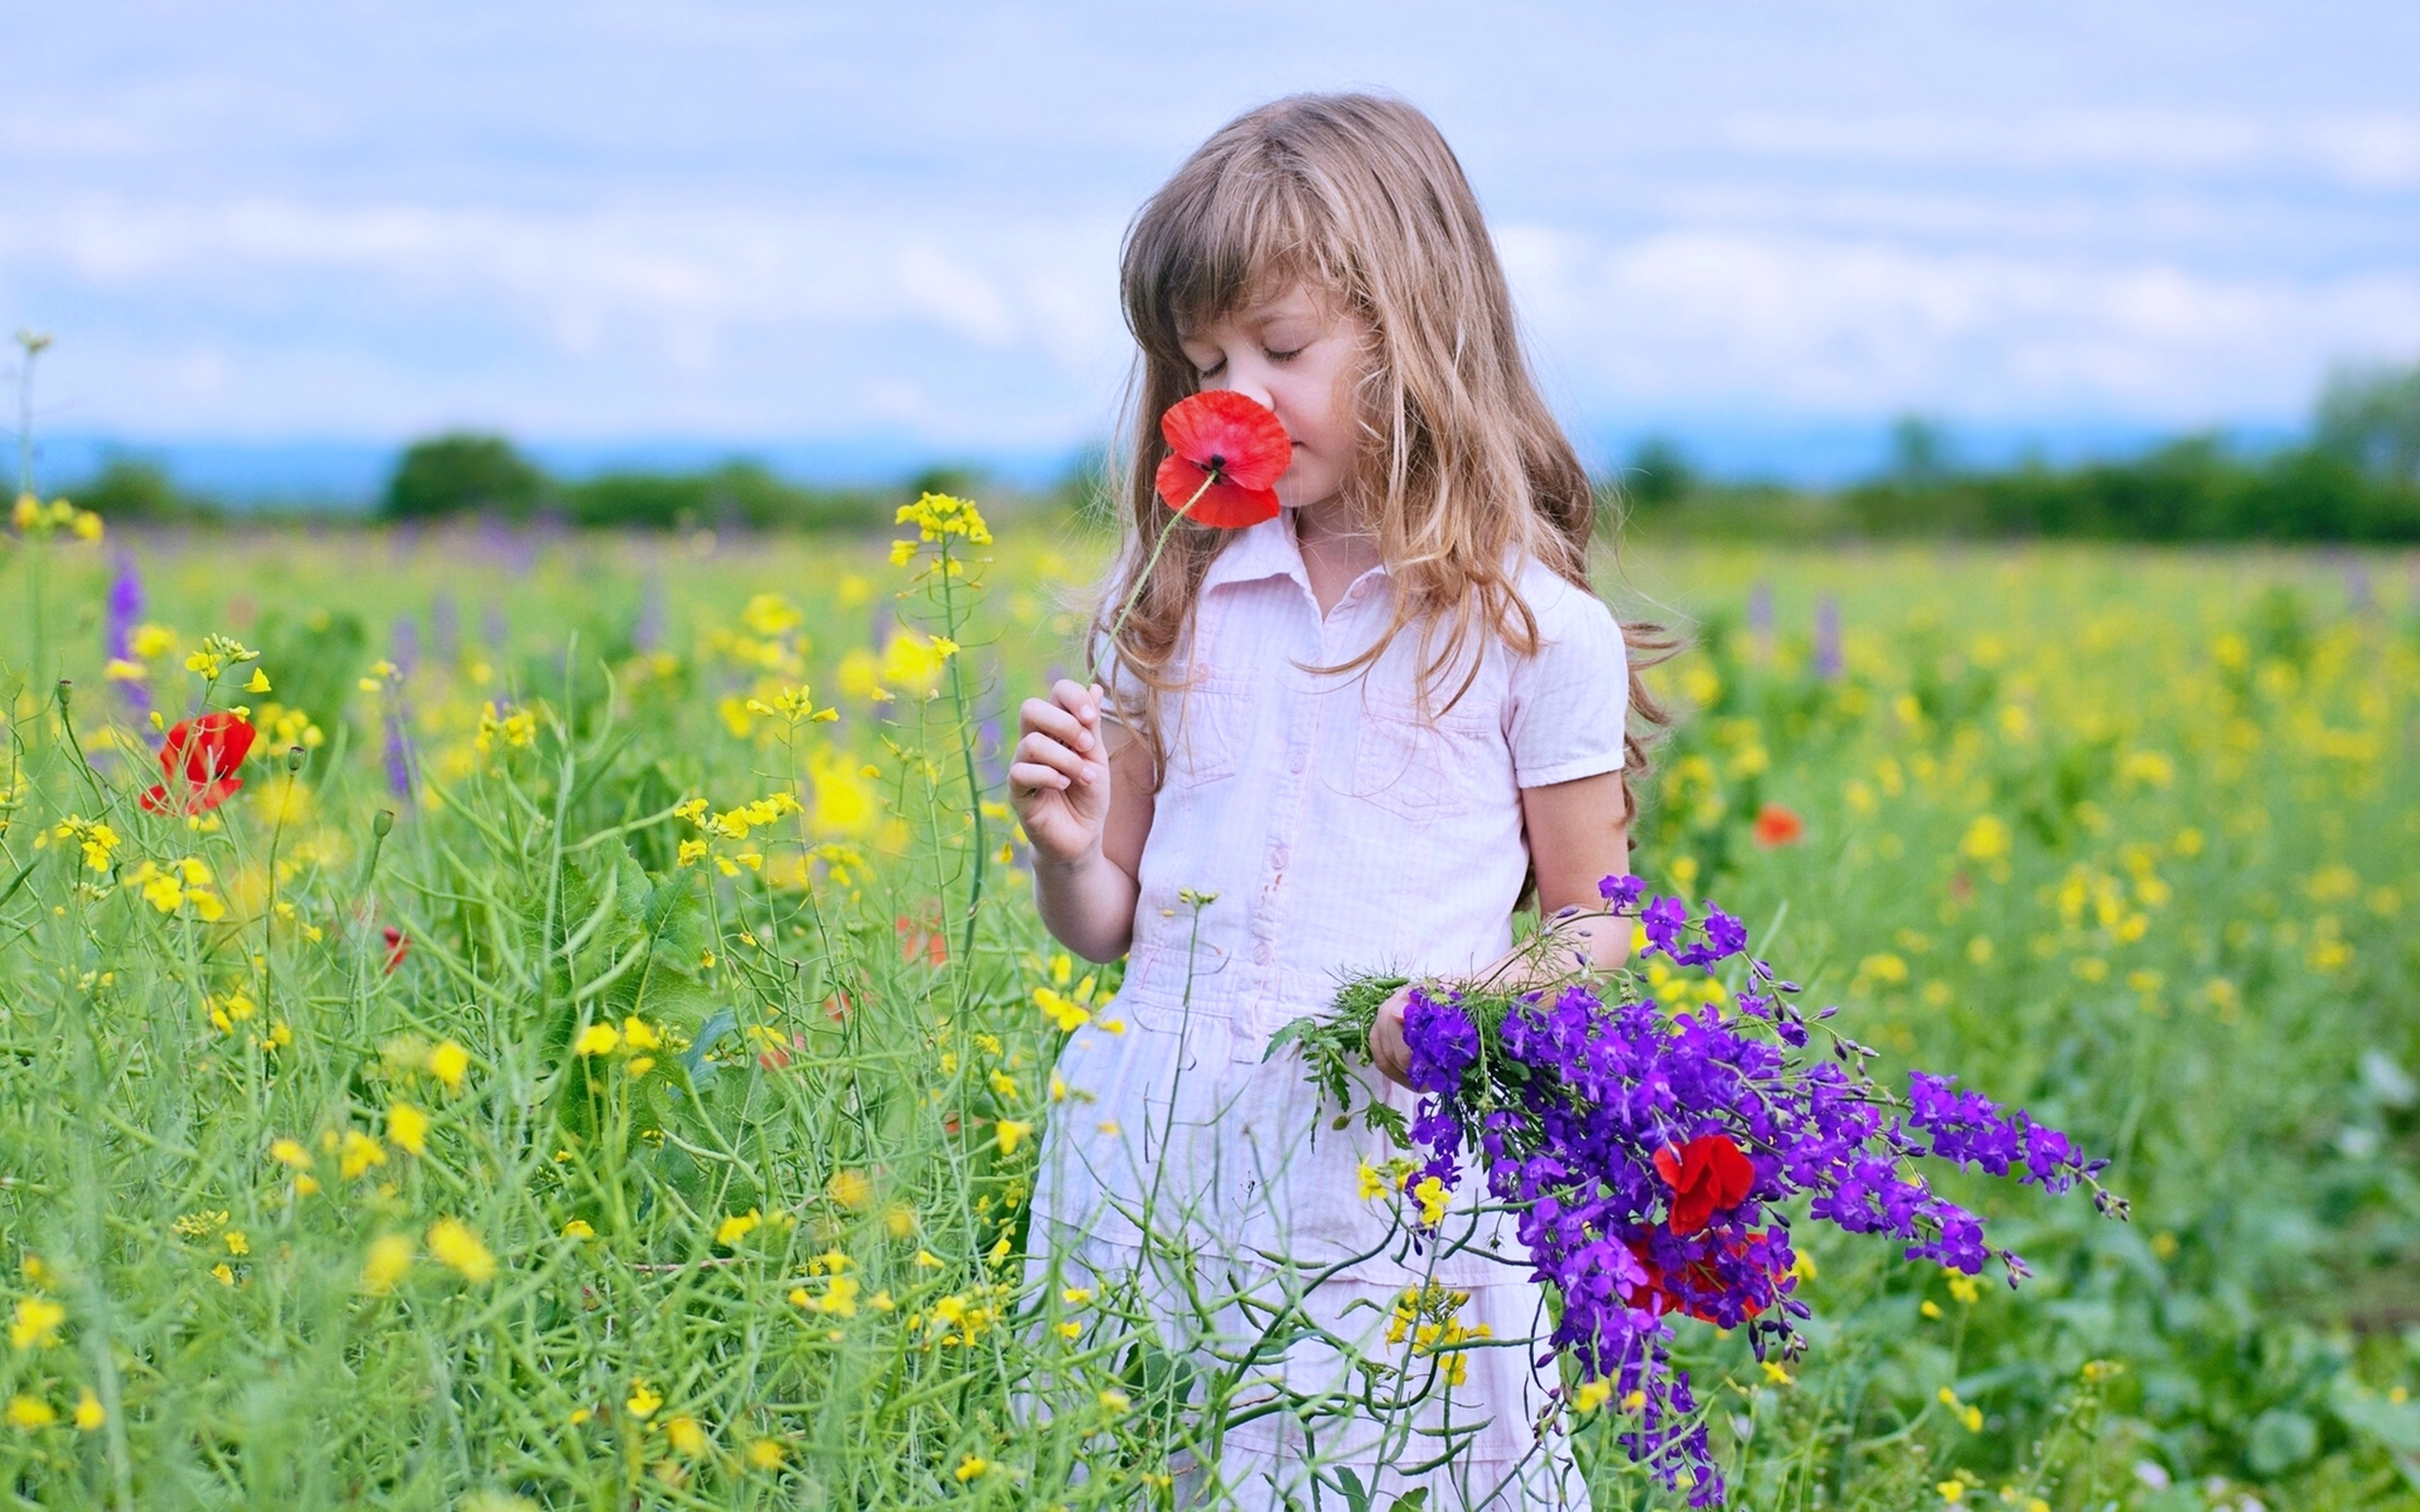 Kids Children Nature Landscapes Flowers Fields Spring Joy Fun Happy